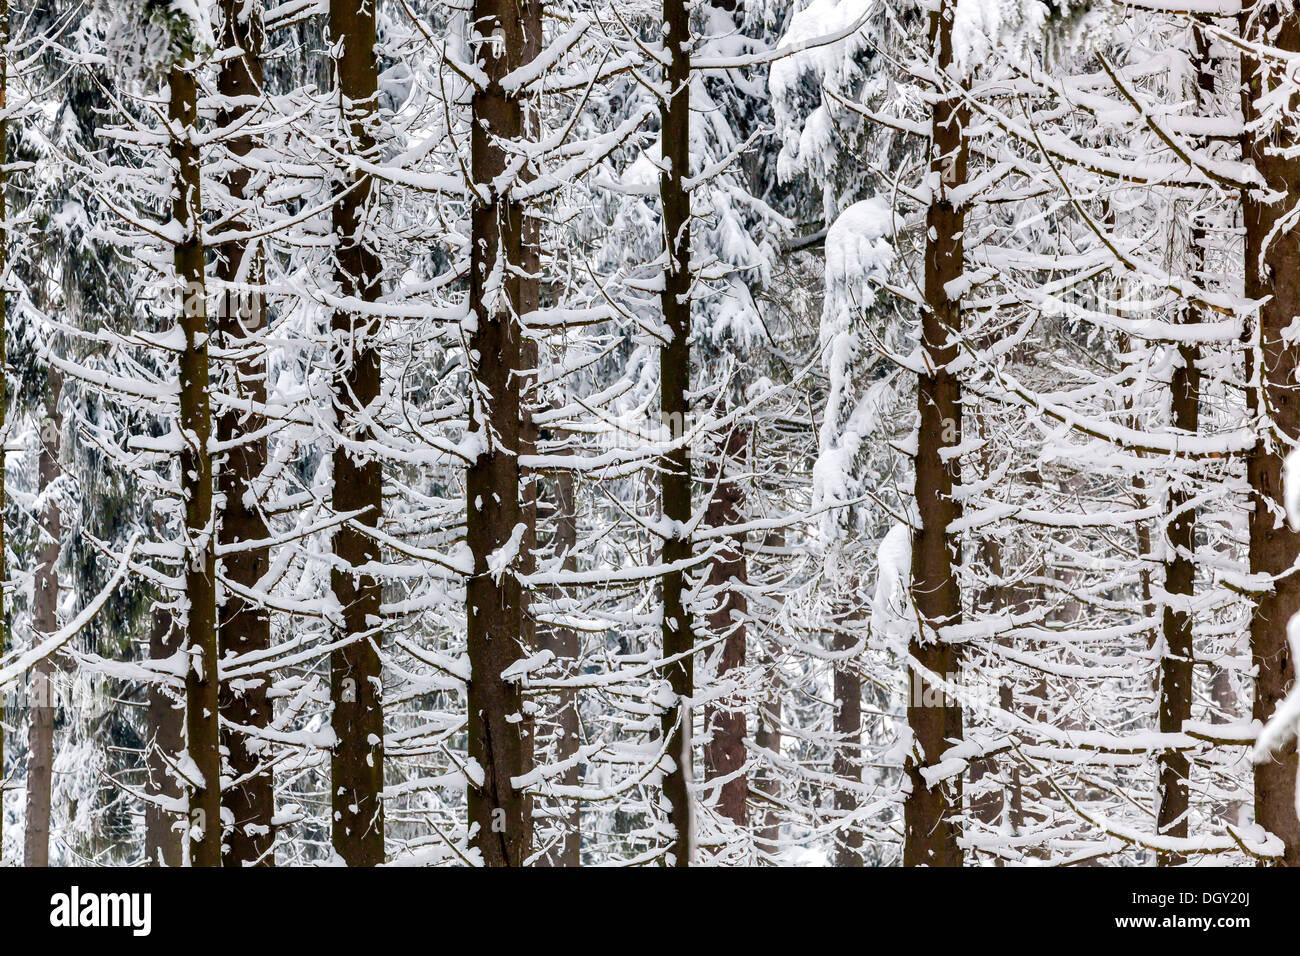 Conifer forest in winter, Sankt Englmar, Bavaria, Germany - Stock Image